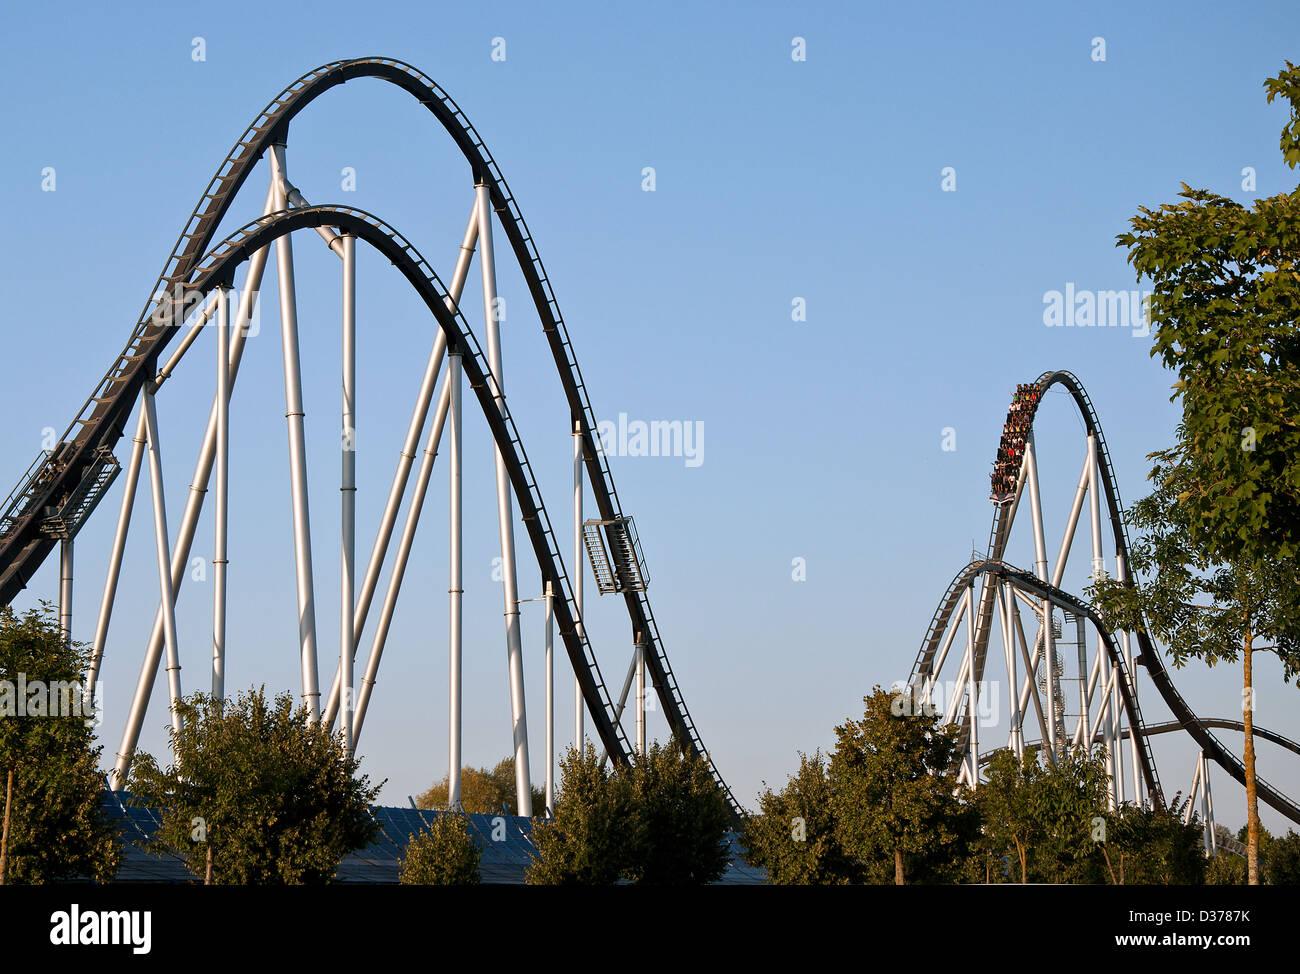 Europapark Alle Achterbahnen